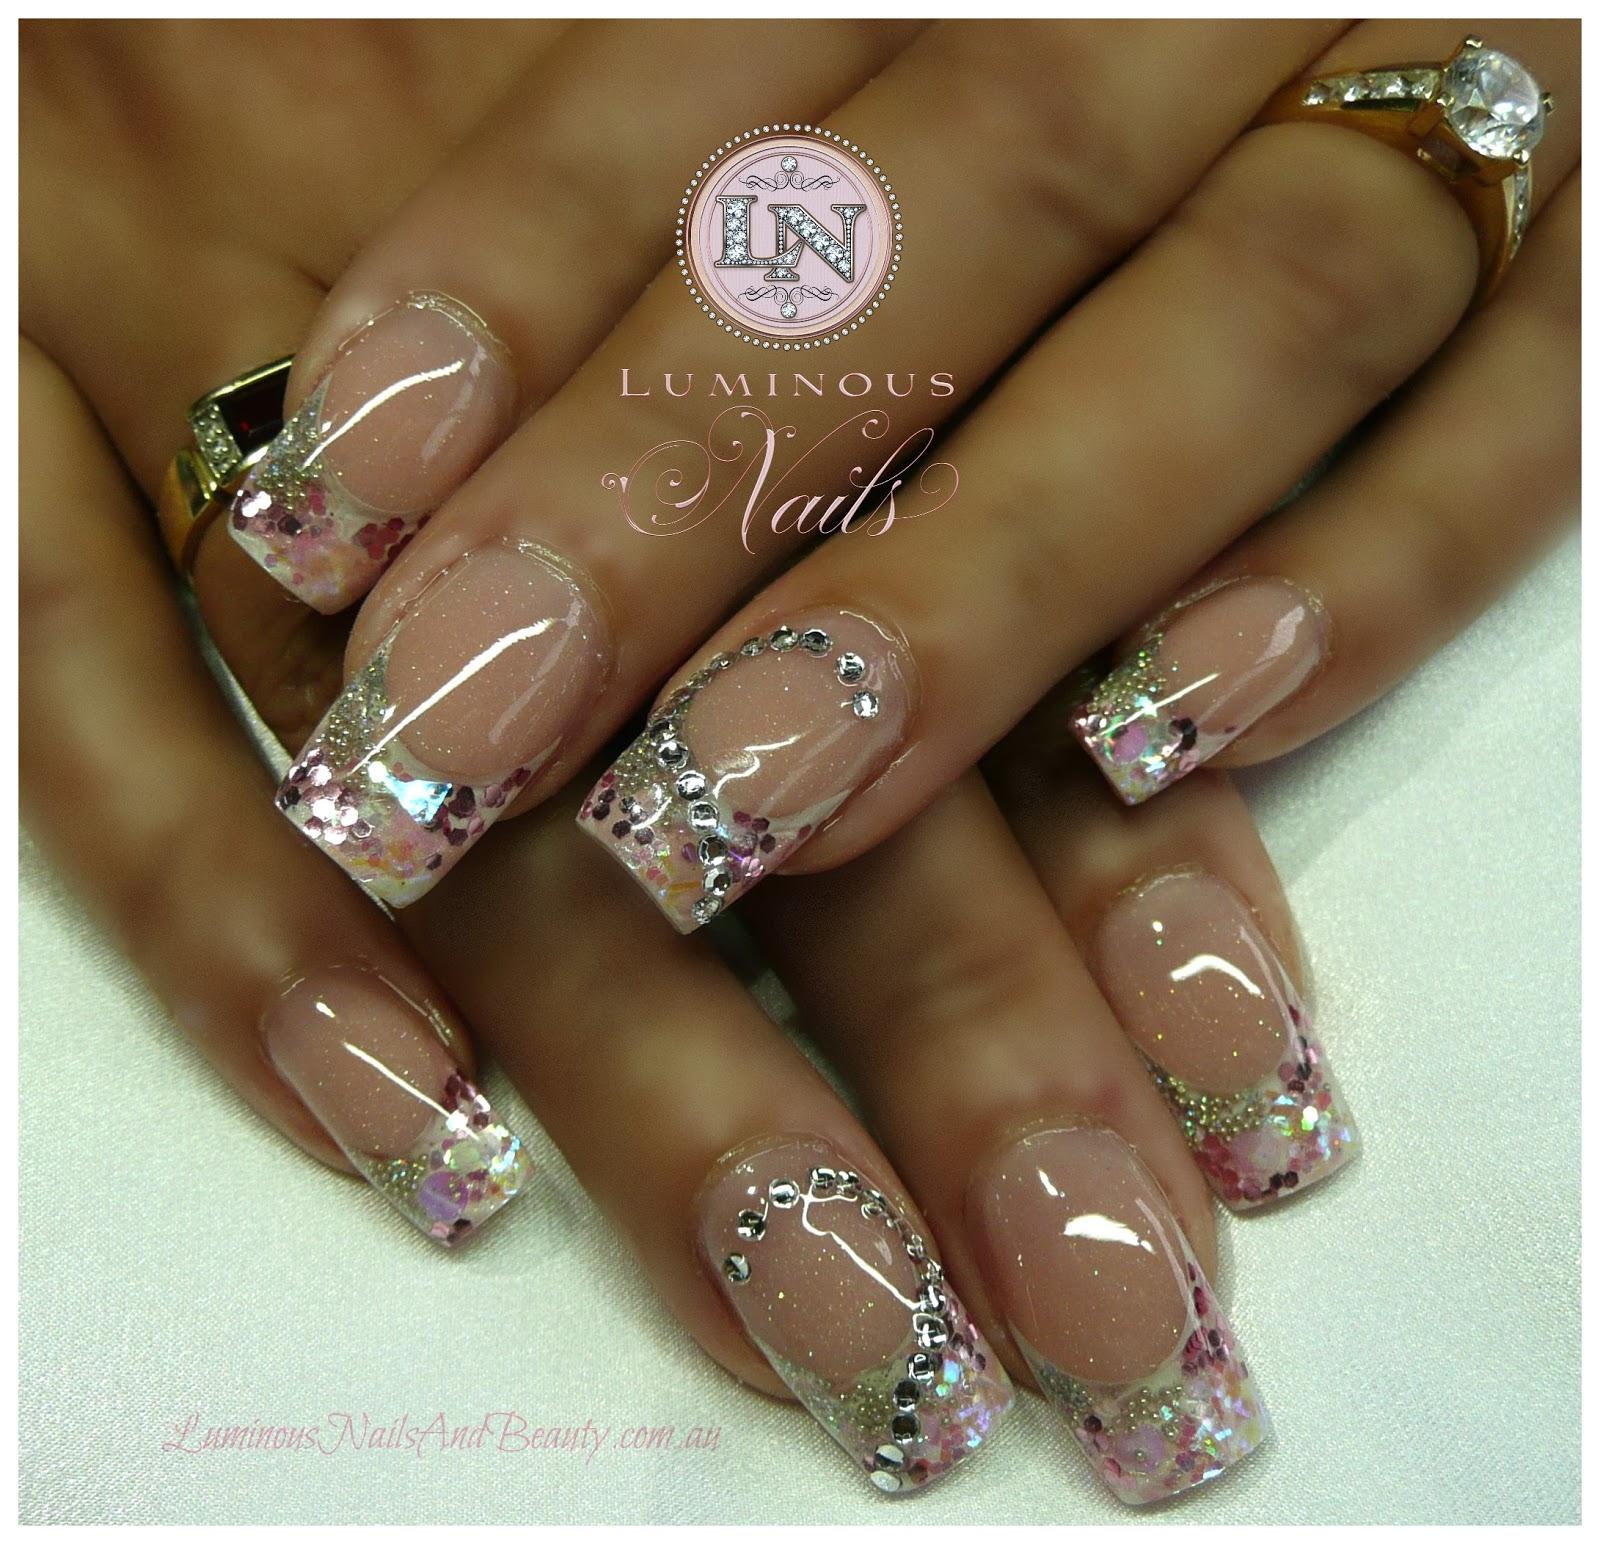 Manicure Nail Supplies Nail Polish Nail Buffer Singapore